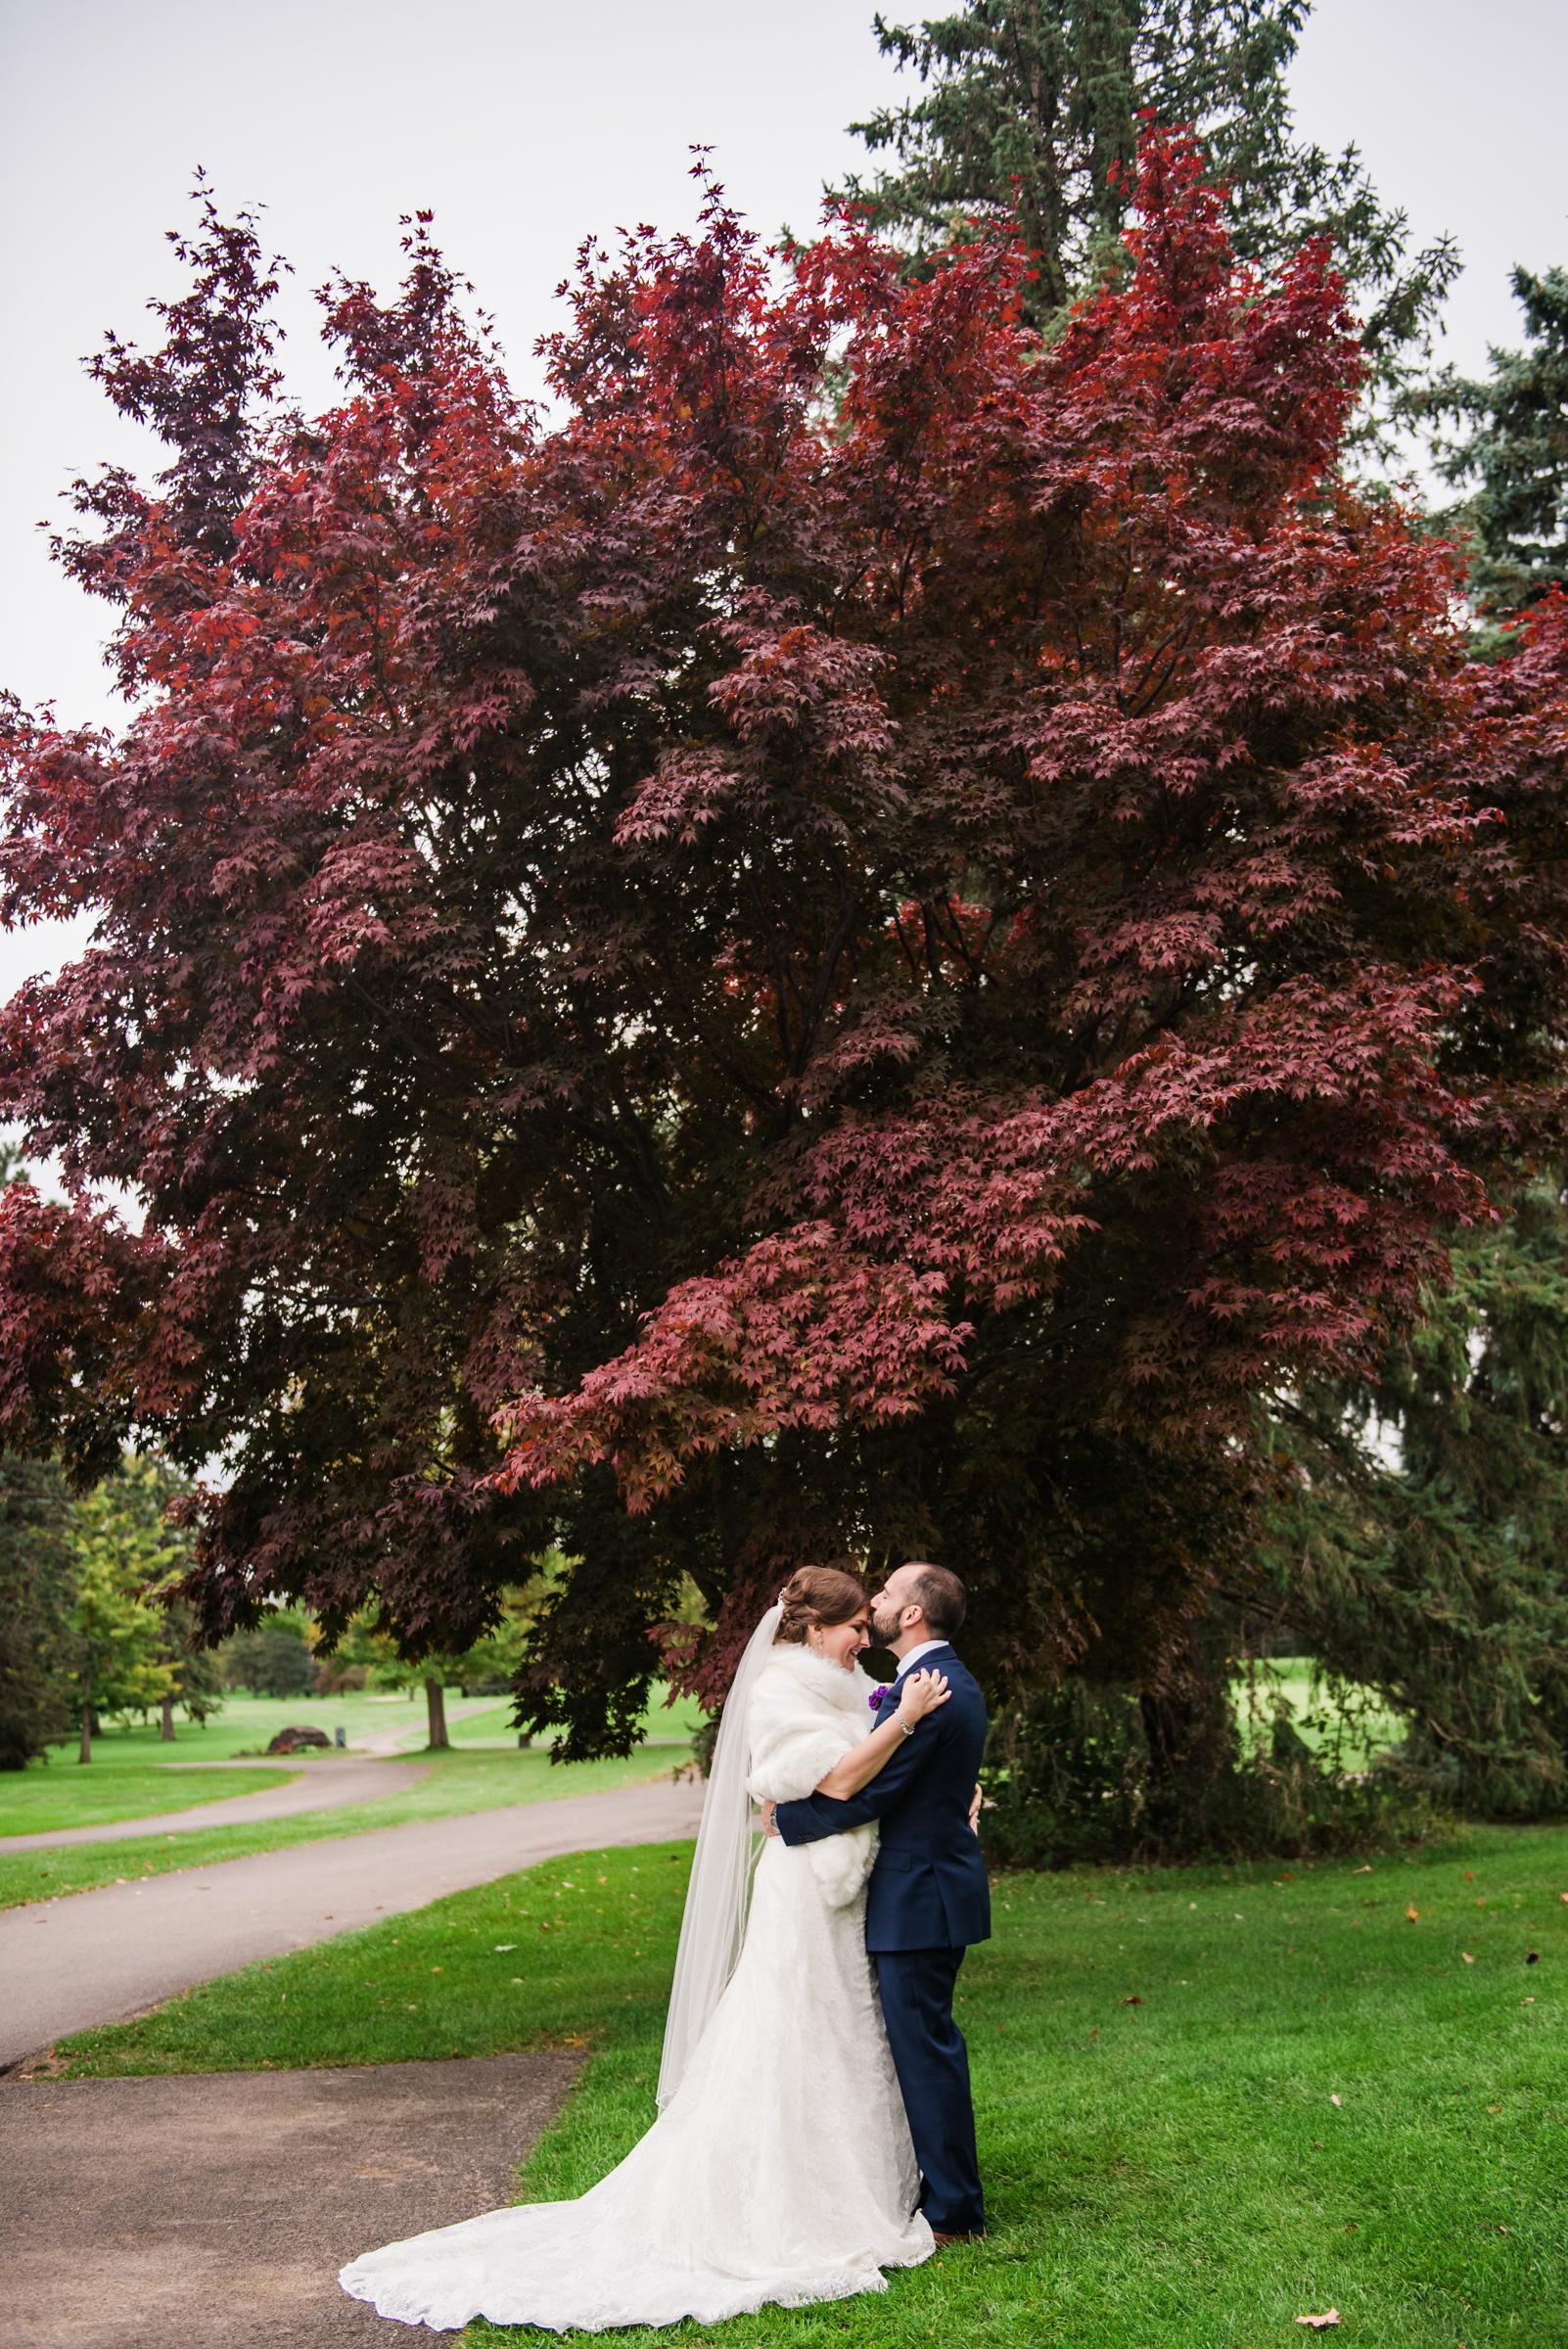 Shadow_Lake_Rochester_Wedding_JILL_STUDIO_Rochester_NY_Photographer_DSC_6050.jpg